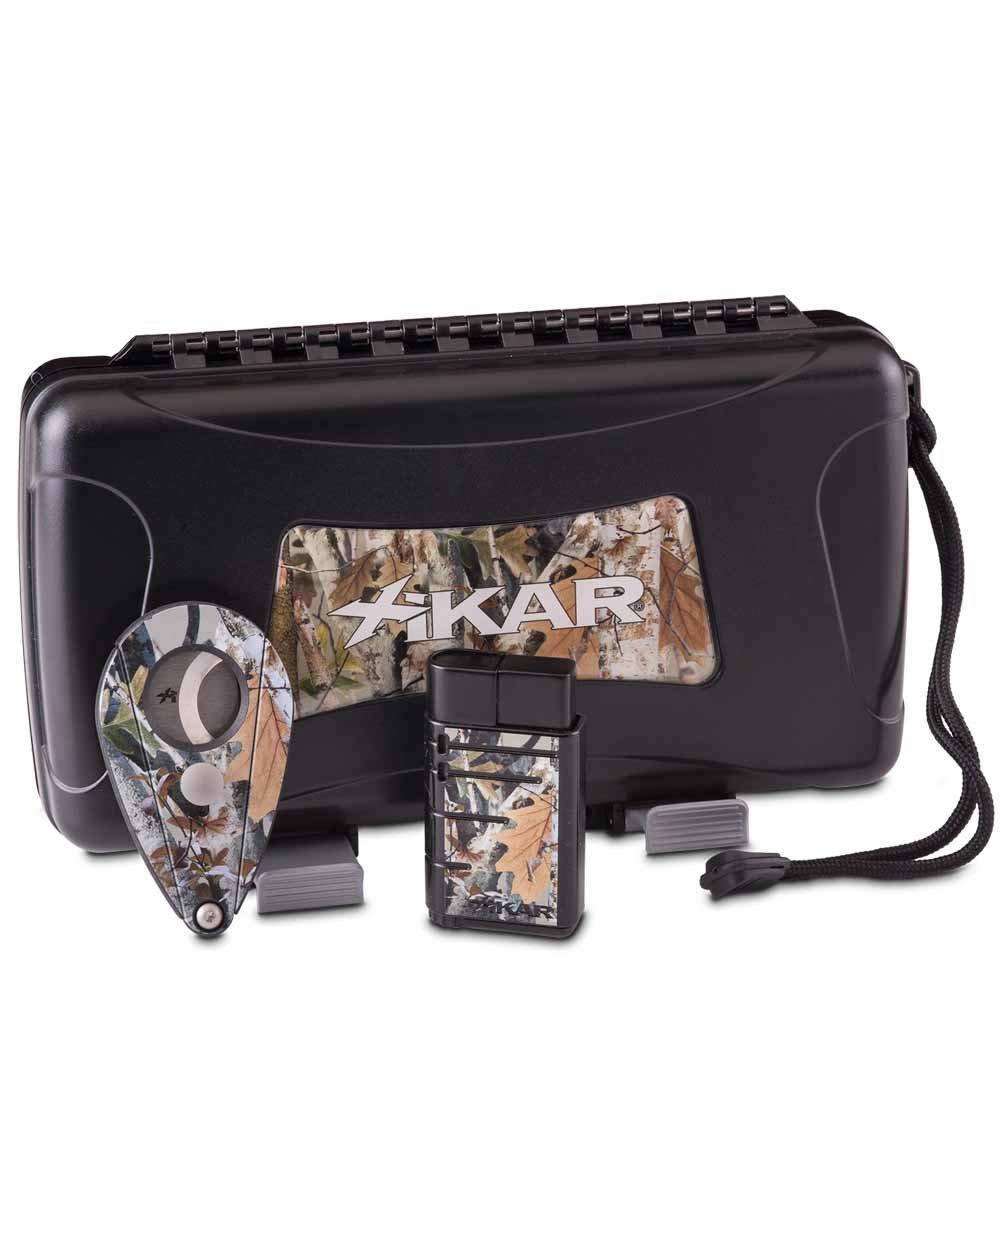 Bullseye Limited Edition Gift Set Xi2 Camo Cutter Linea Single Flame Lighter Warranty